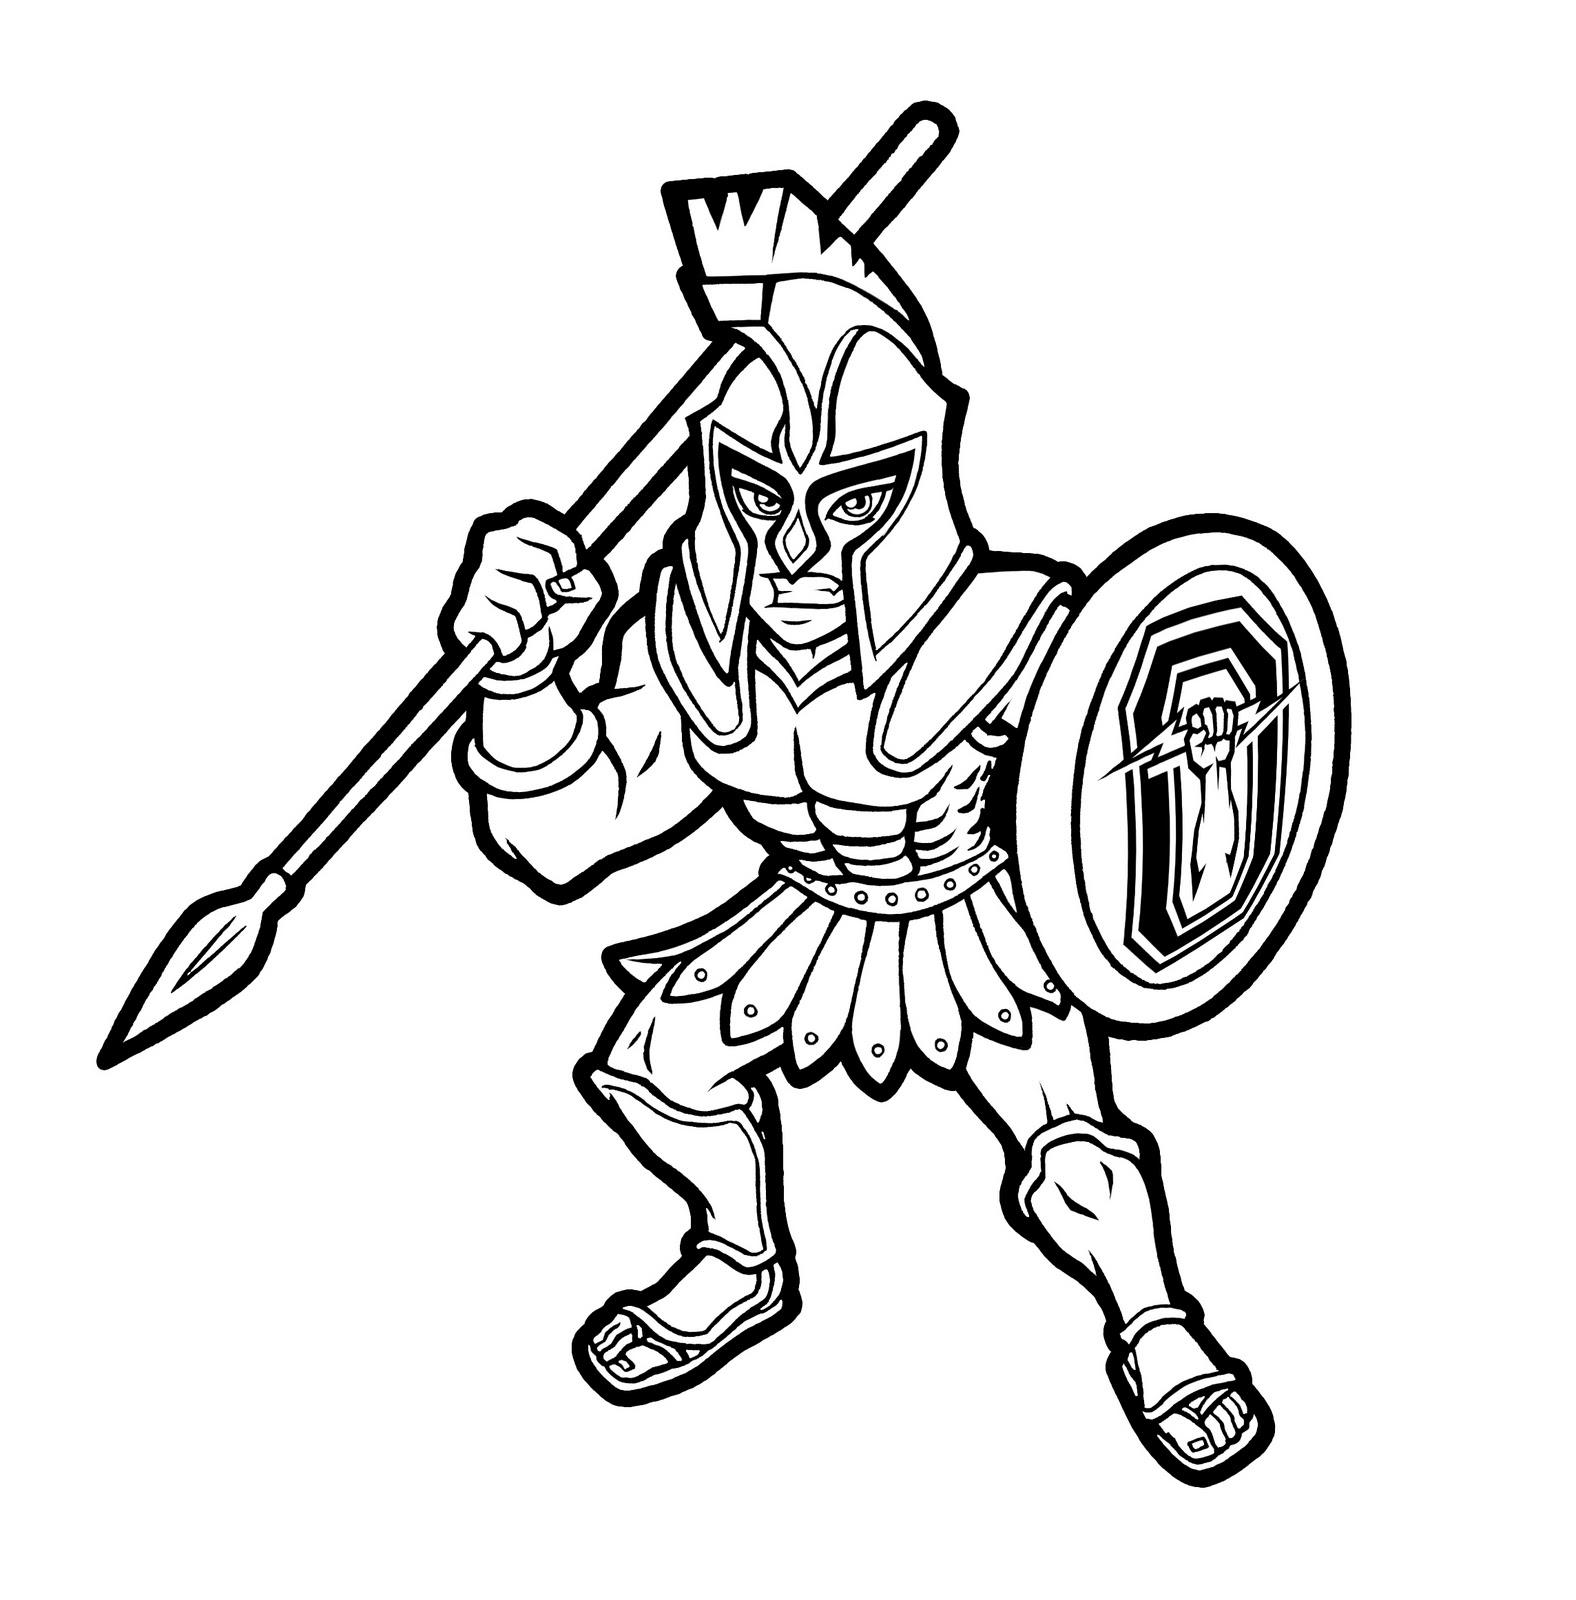 1576x1600 Logo Design For High School Wrestling Team Seung's Fun Stuff Blog